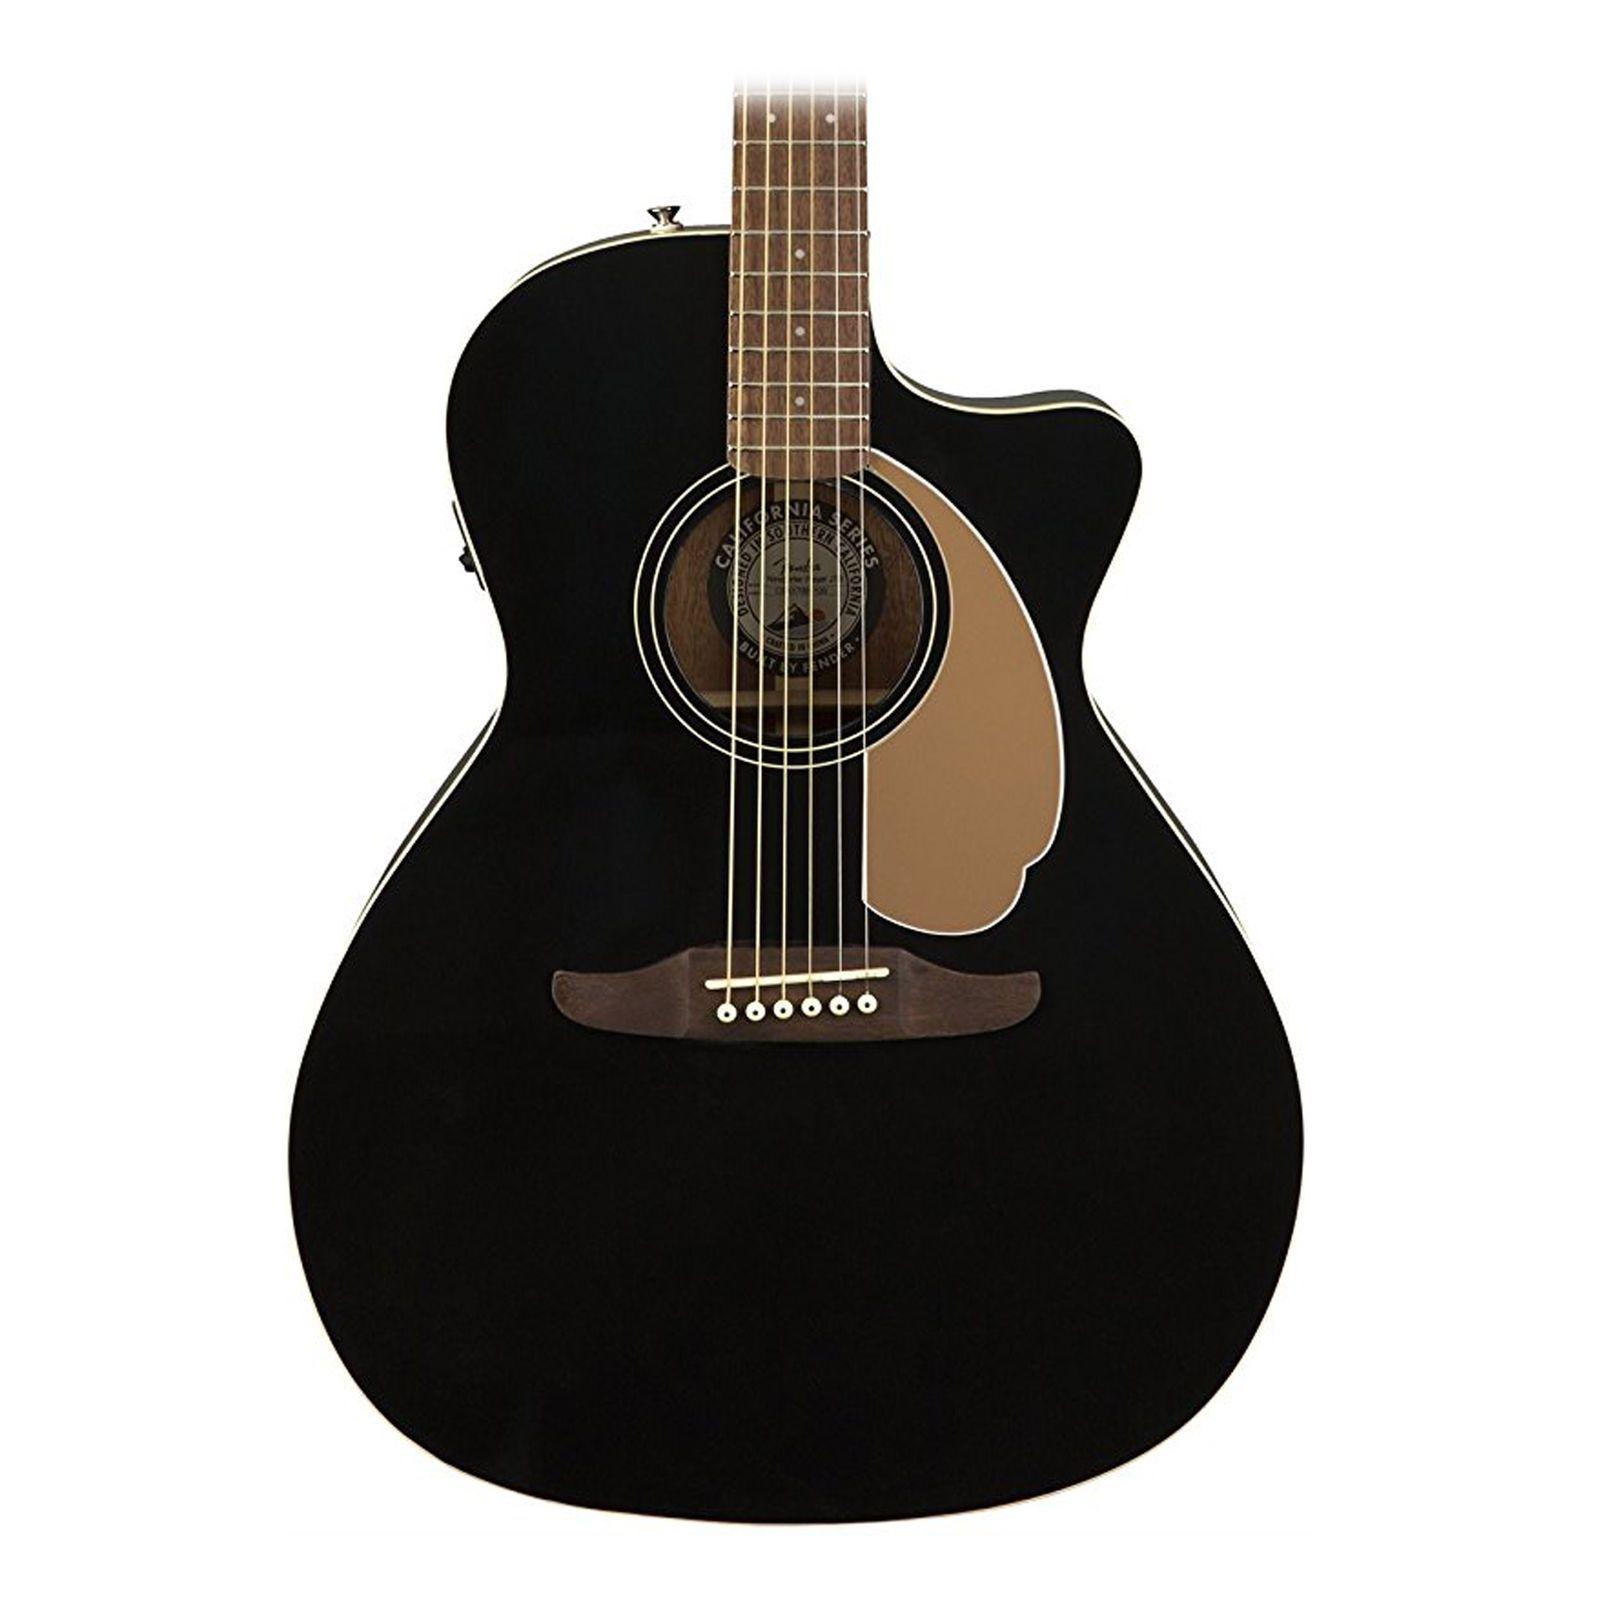 Fender Newporter Player California Series Acoustic Guitar Jetty Black Finish   Guitar. Acoustic guitar. Acoustic